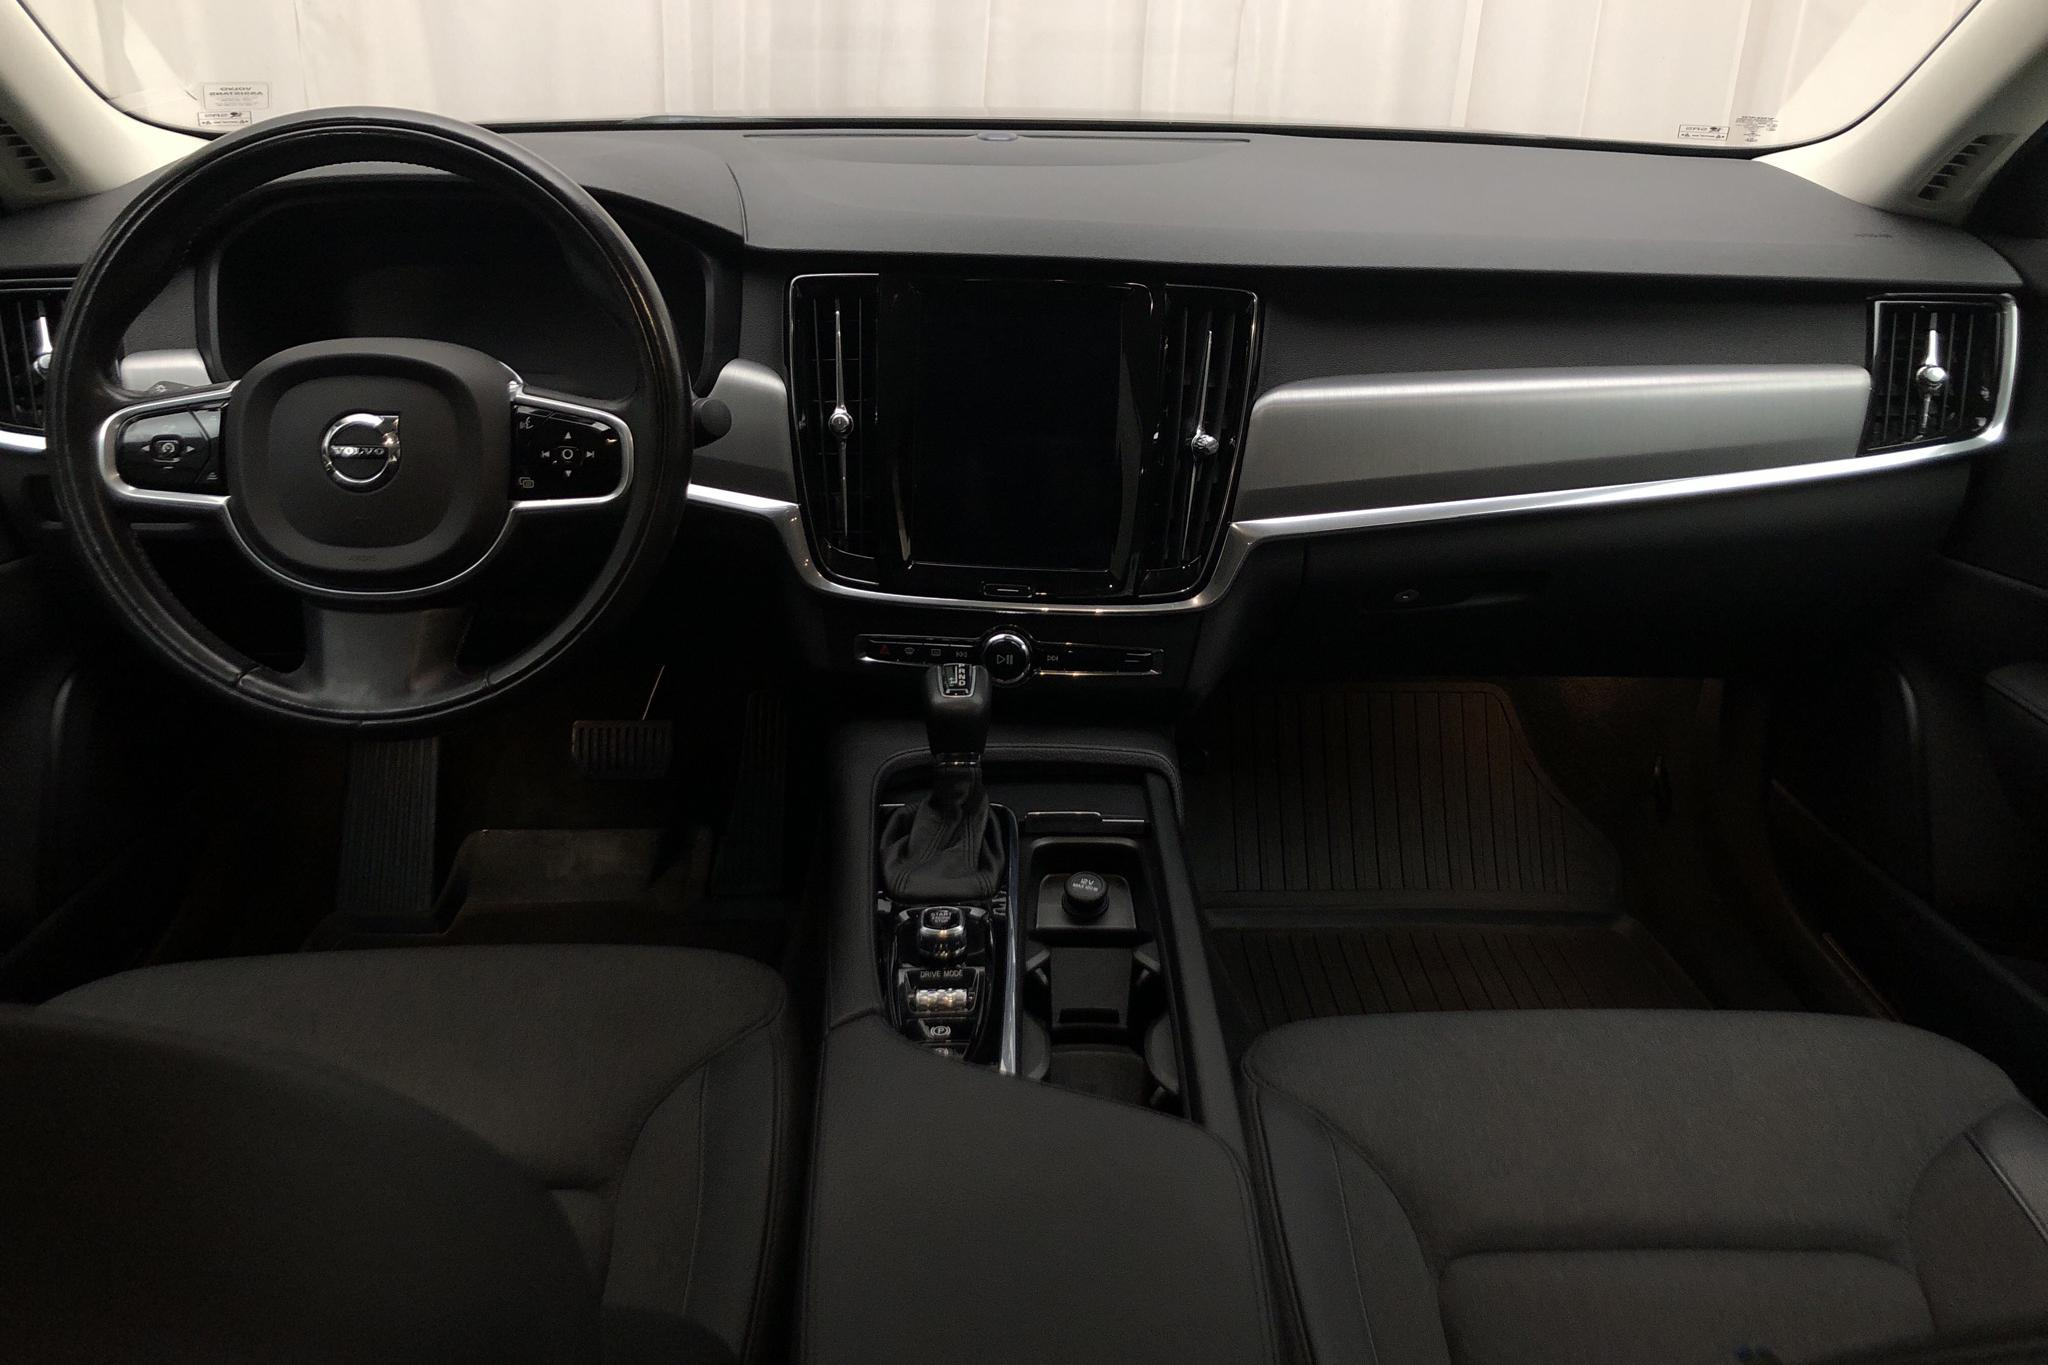 Volvo S90 D4 (190hk) - 89 970 km - Automatic - Dark Brown - 2018